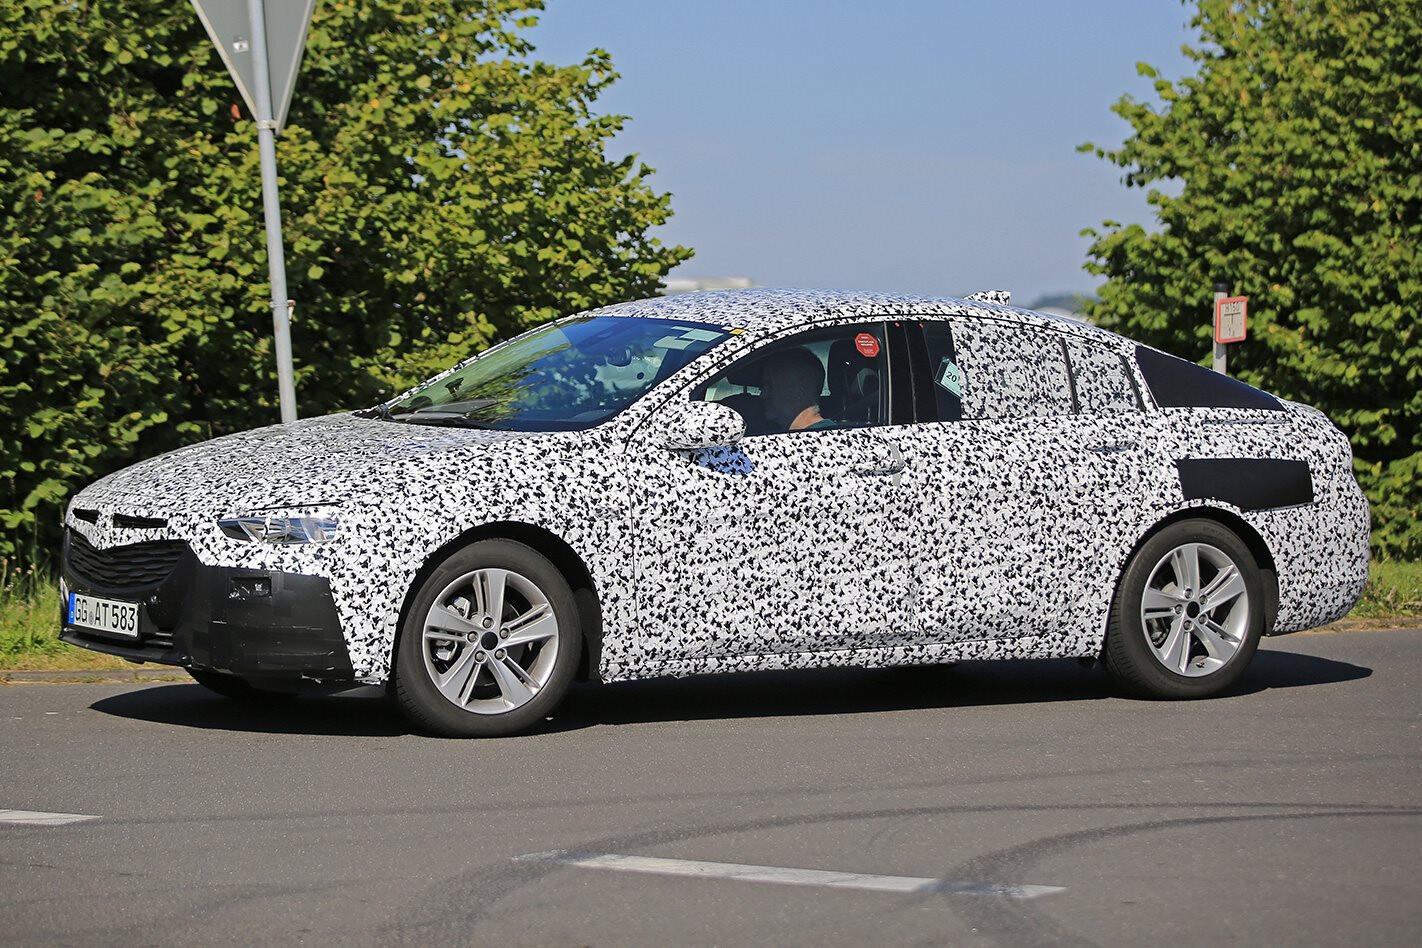 2017 Opel Insignia Spy Pics